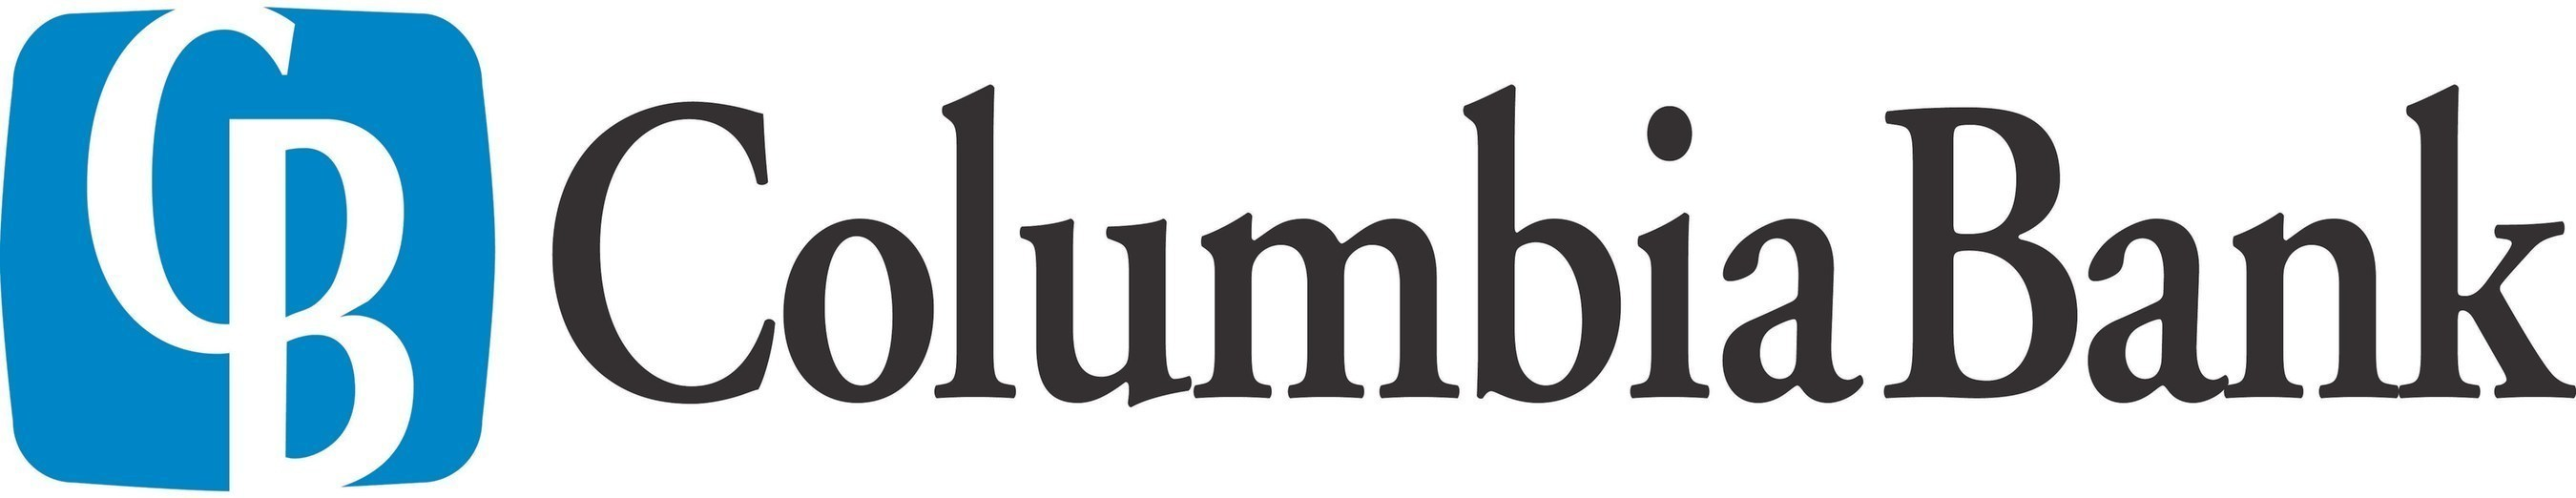 Columbia Bank logo.